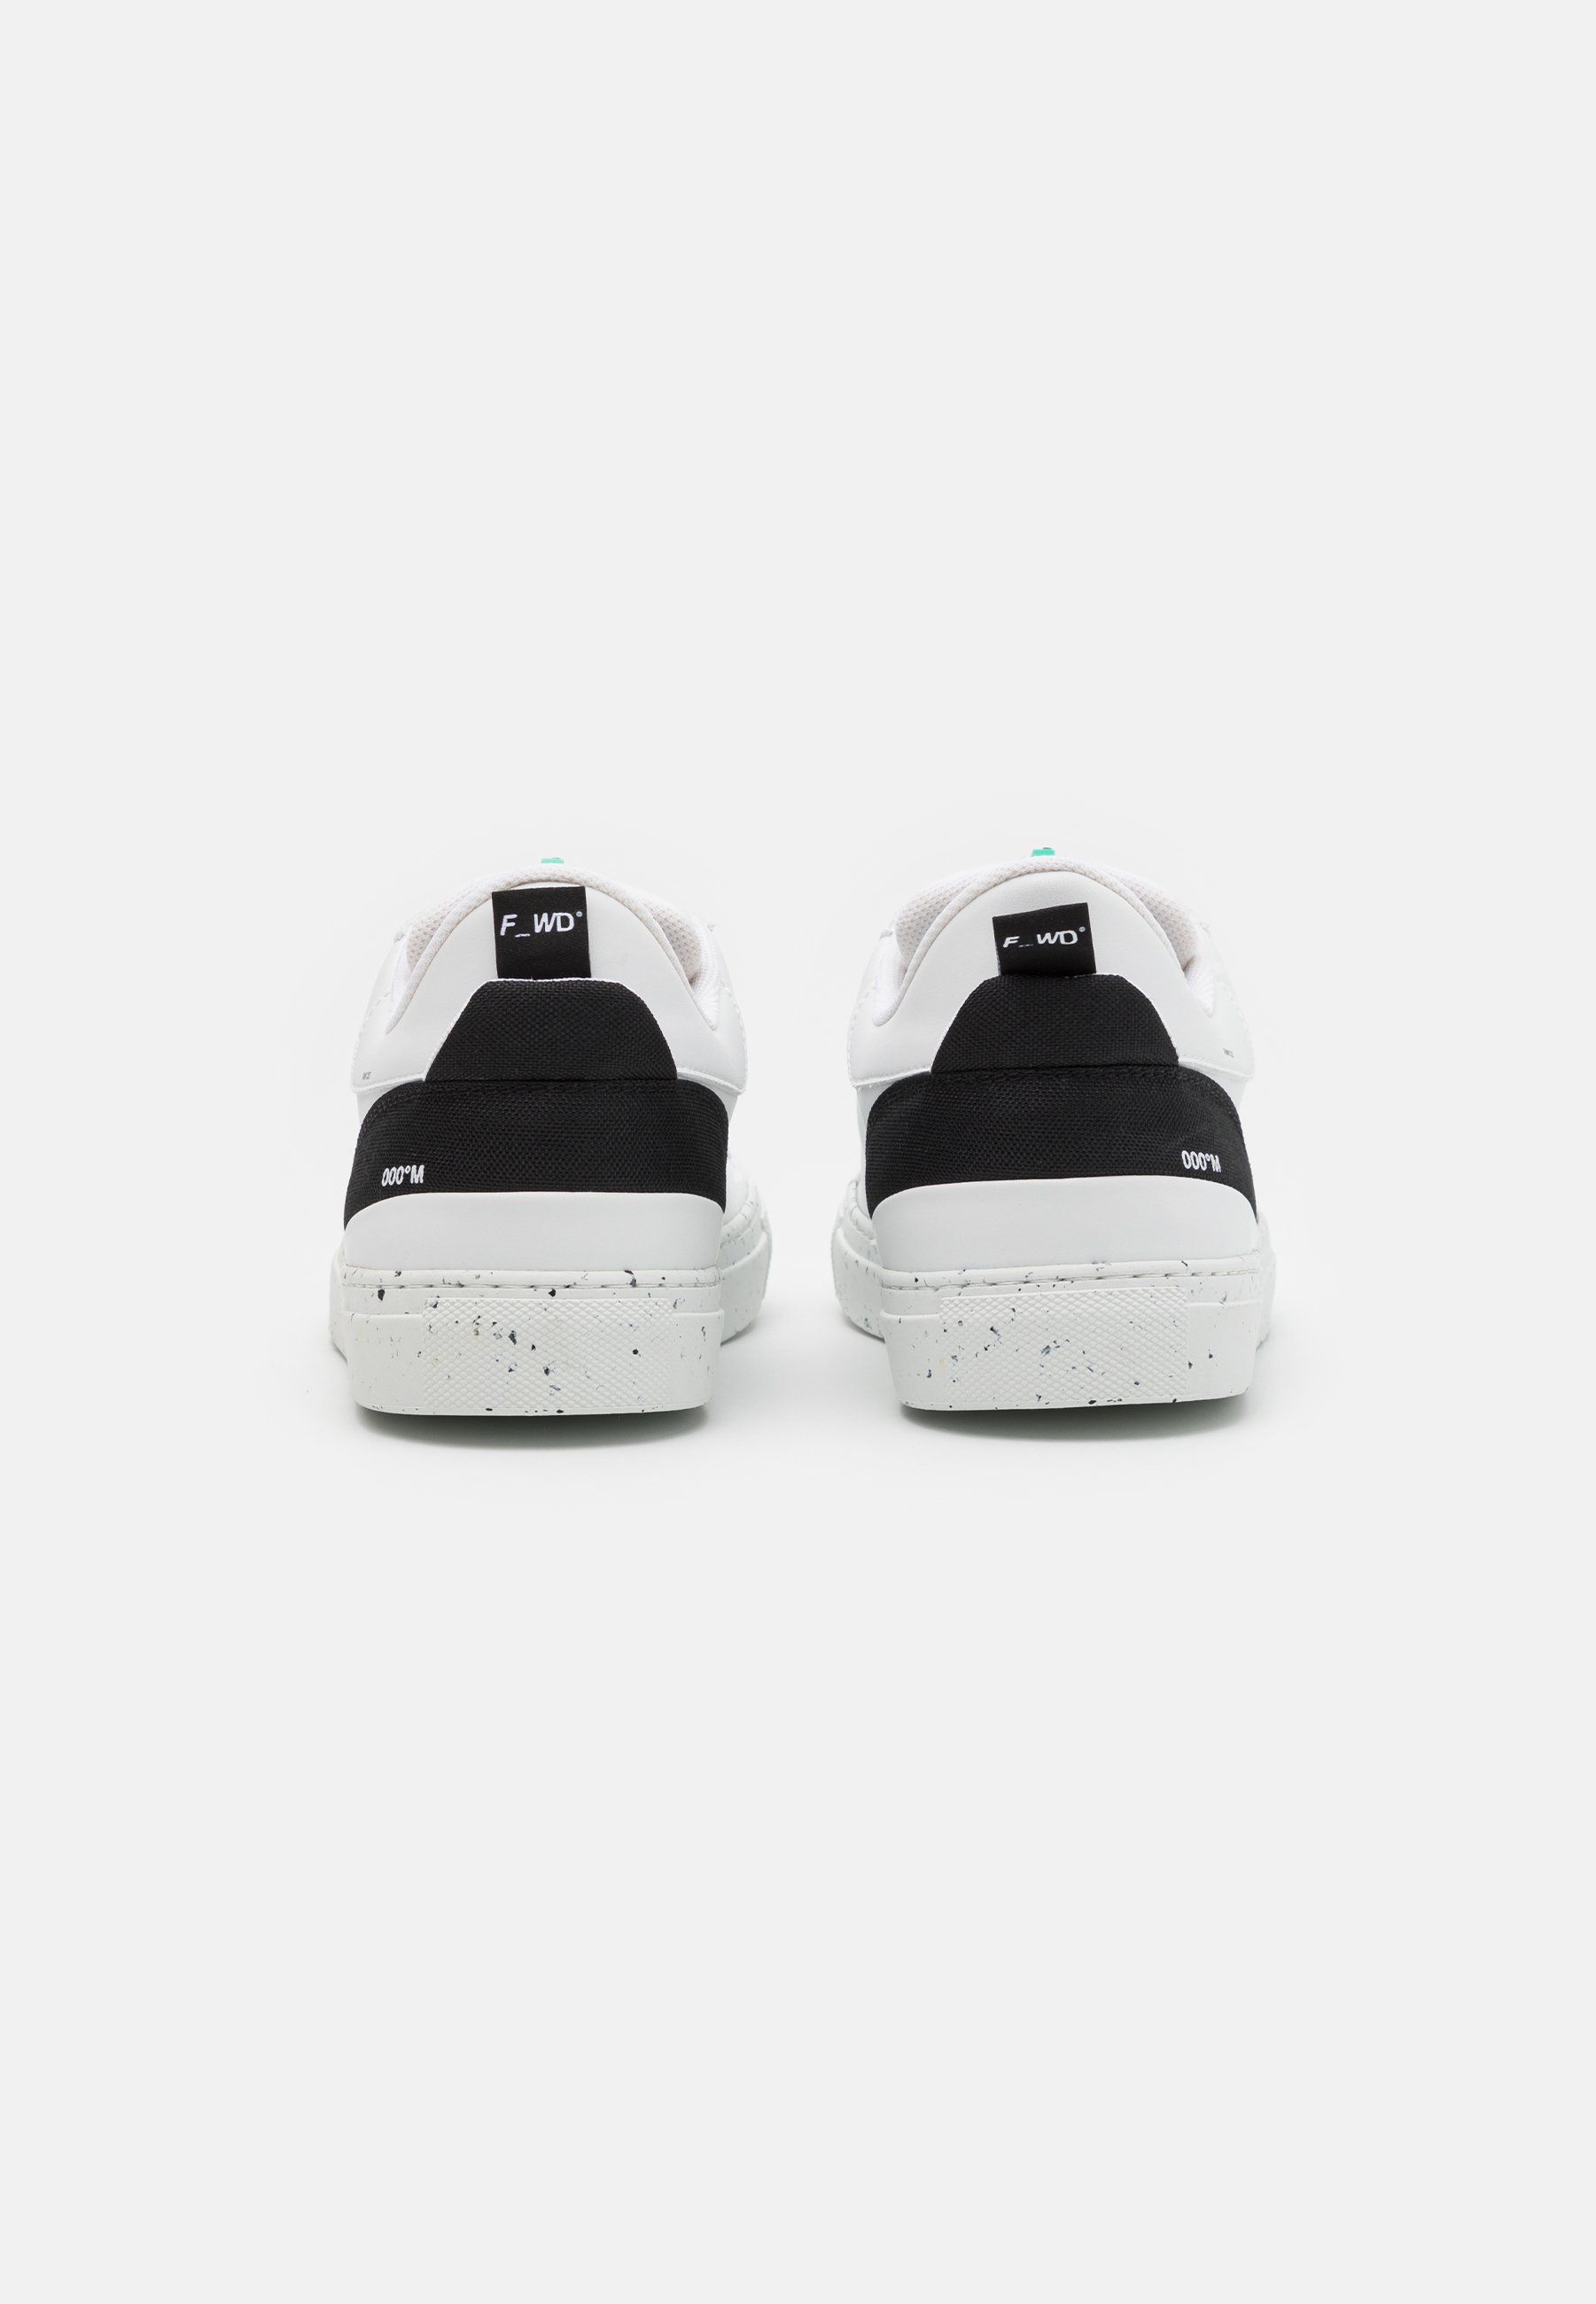 F_WD Sneaker low - white/ecogreen black/weiß - Herrenschuhe uB0PC